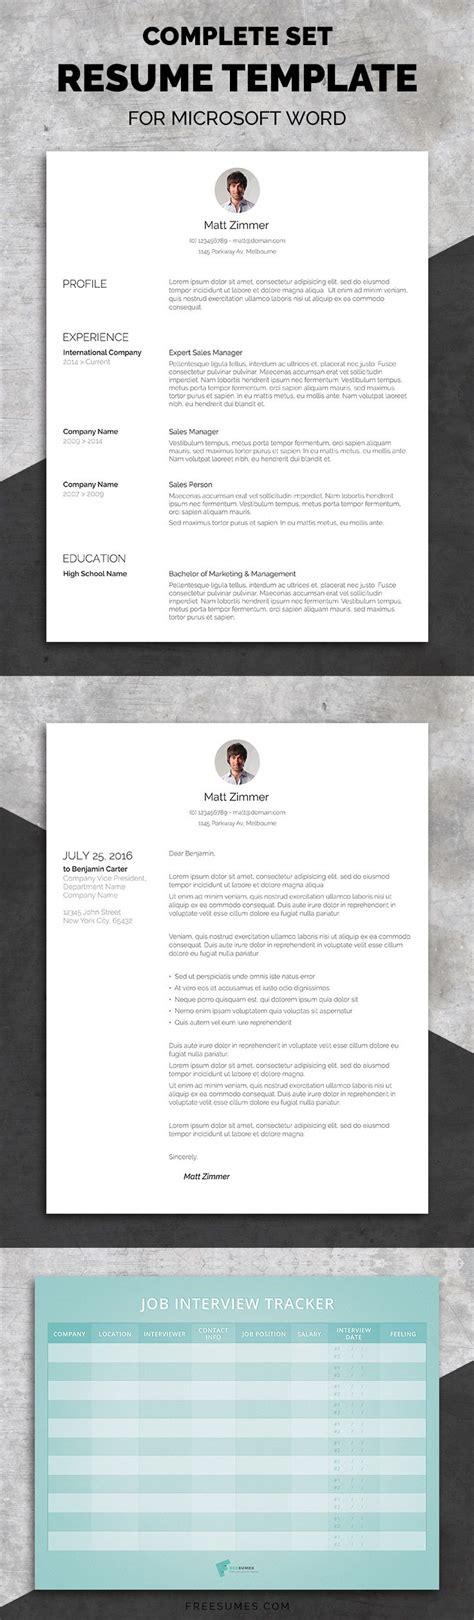 Set Resume Template by Professional Resume Template Set Cv Resume Design